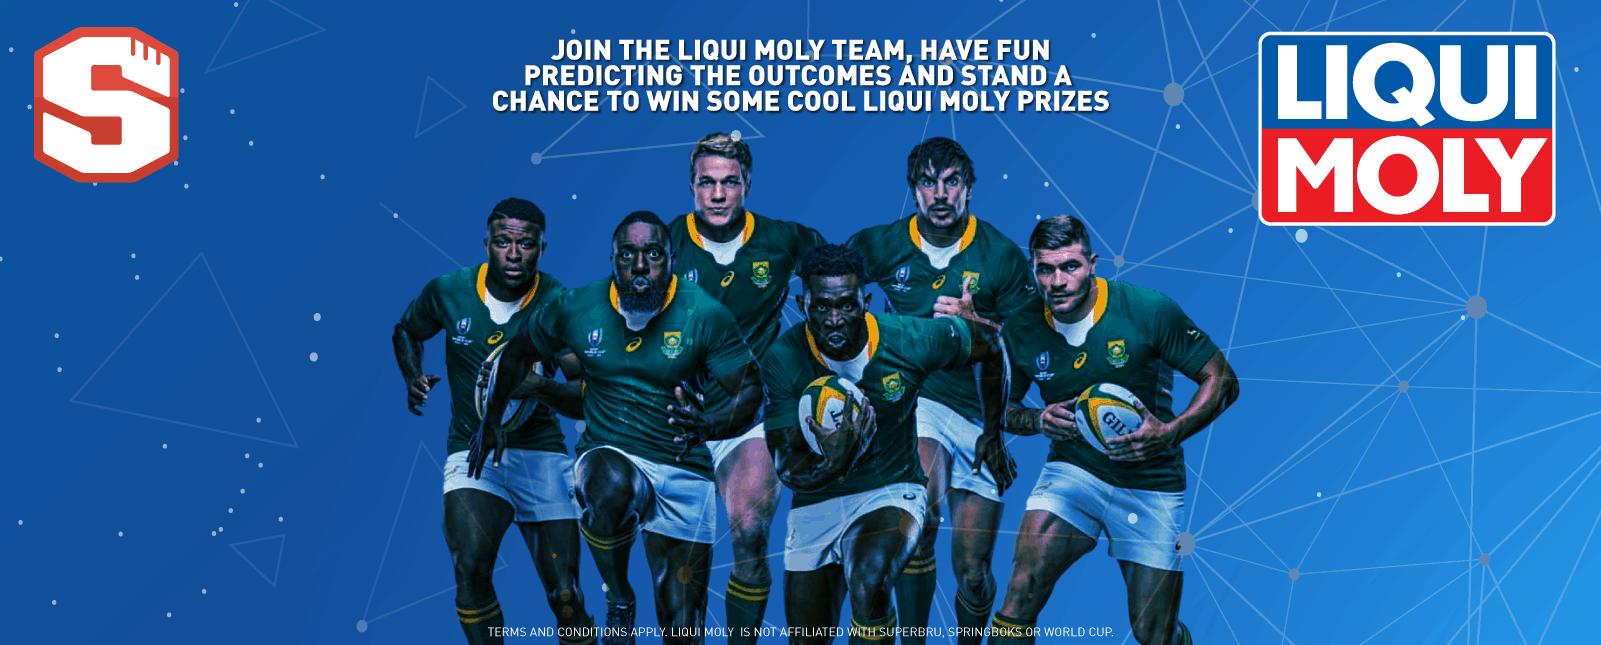 Liqui-Moly-Superbru 2019 campaign